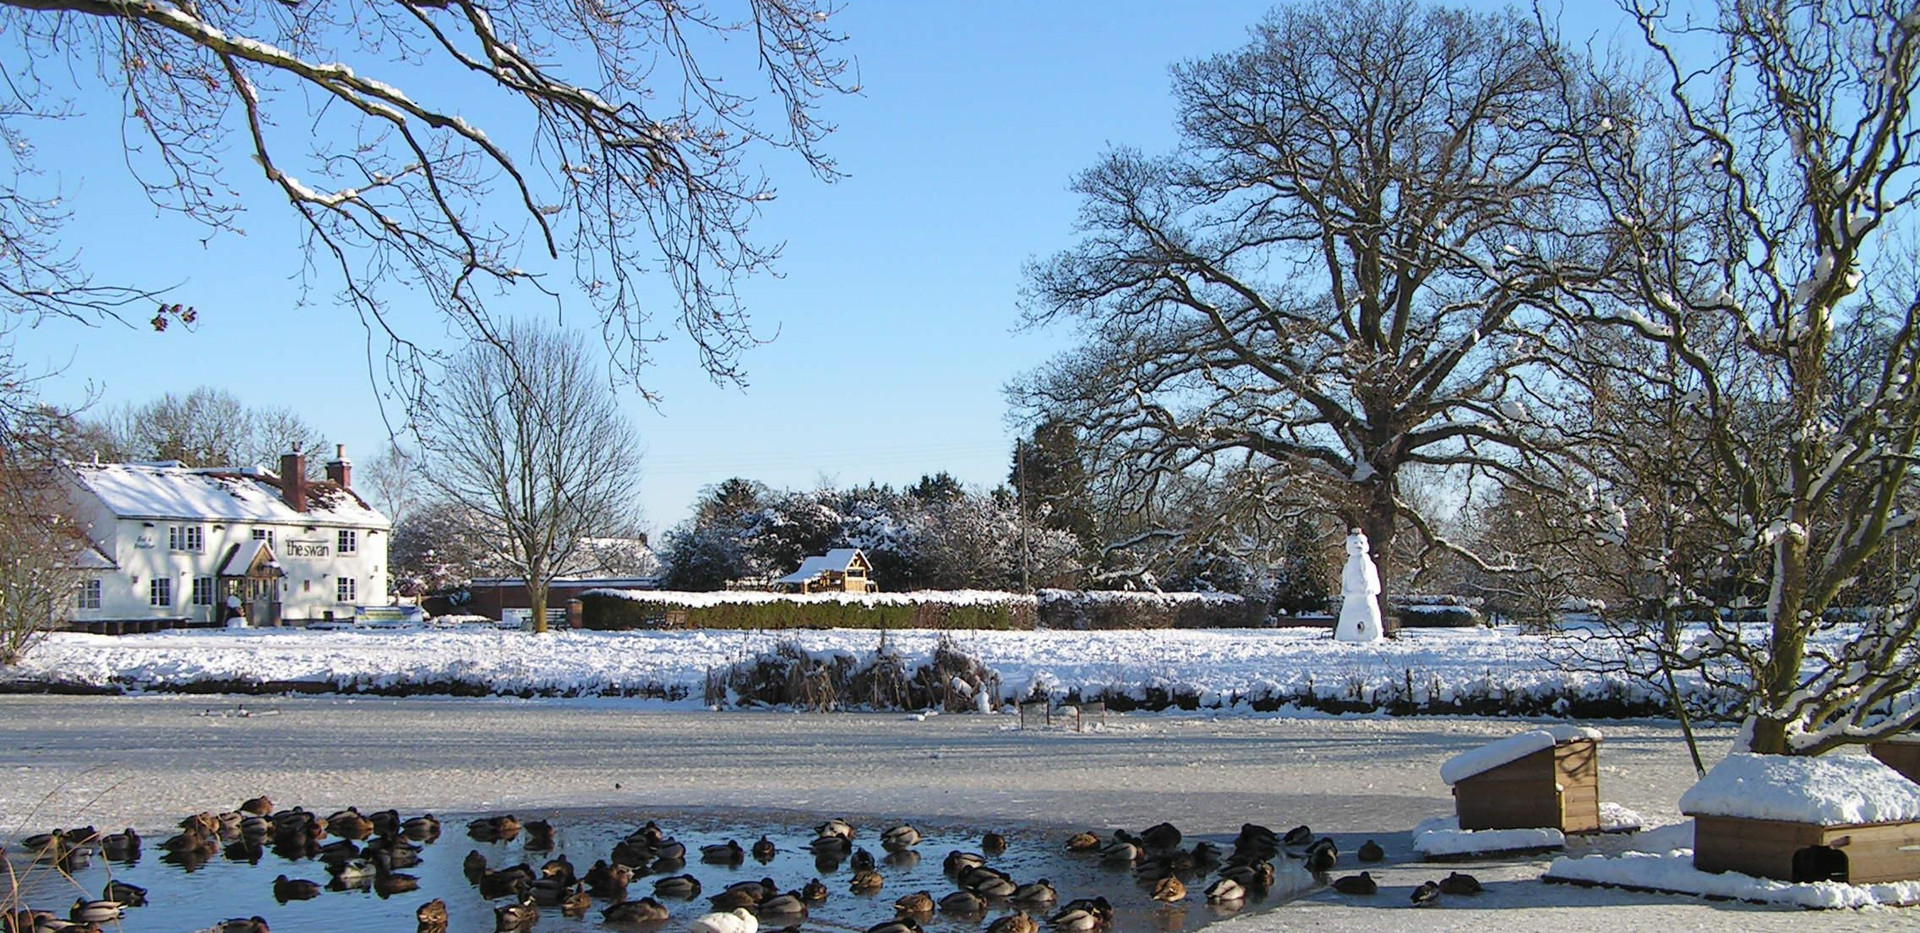 Winter 2010, Hanley Swan pond